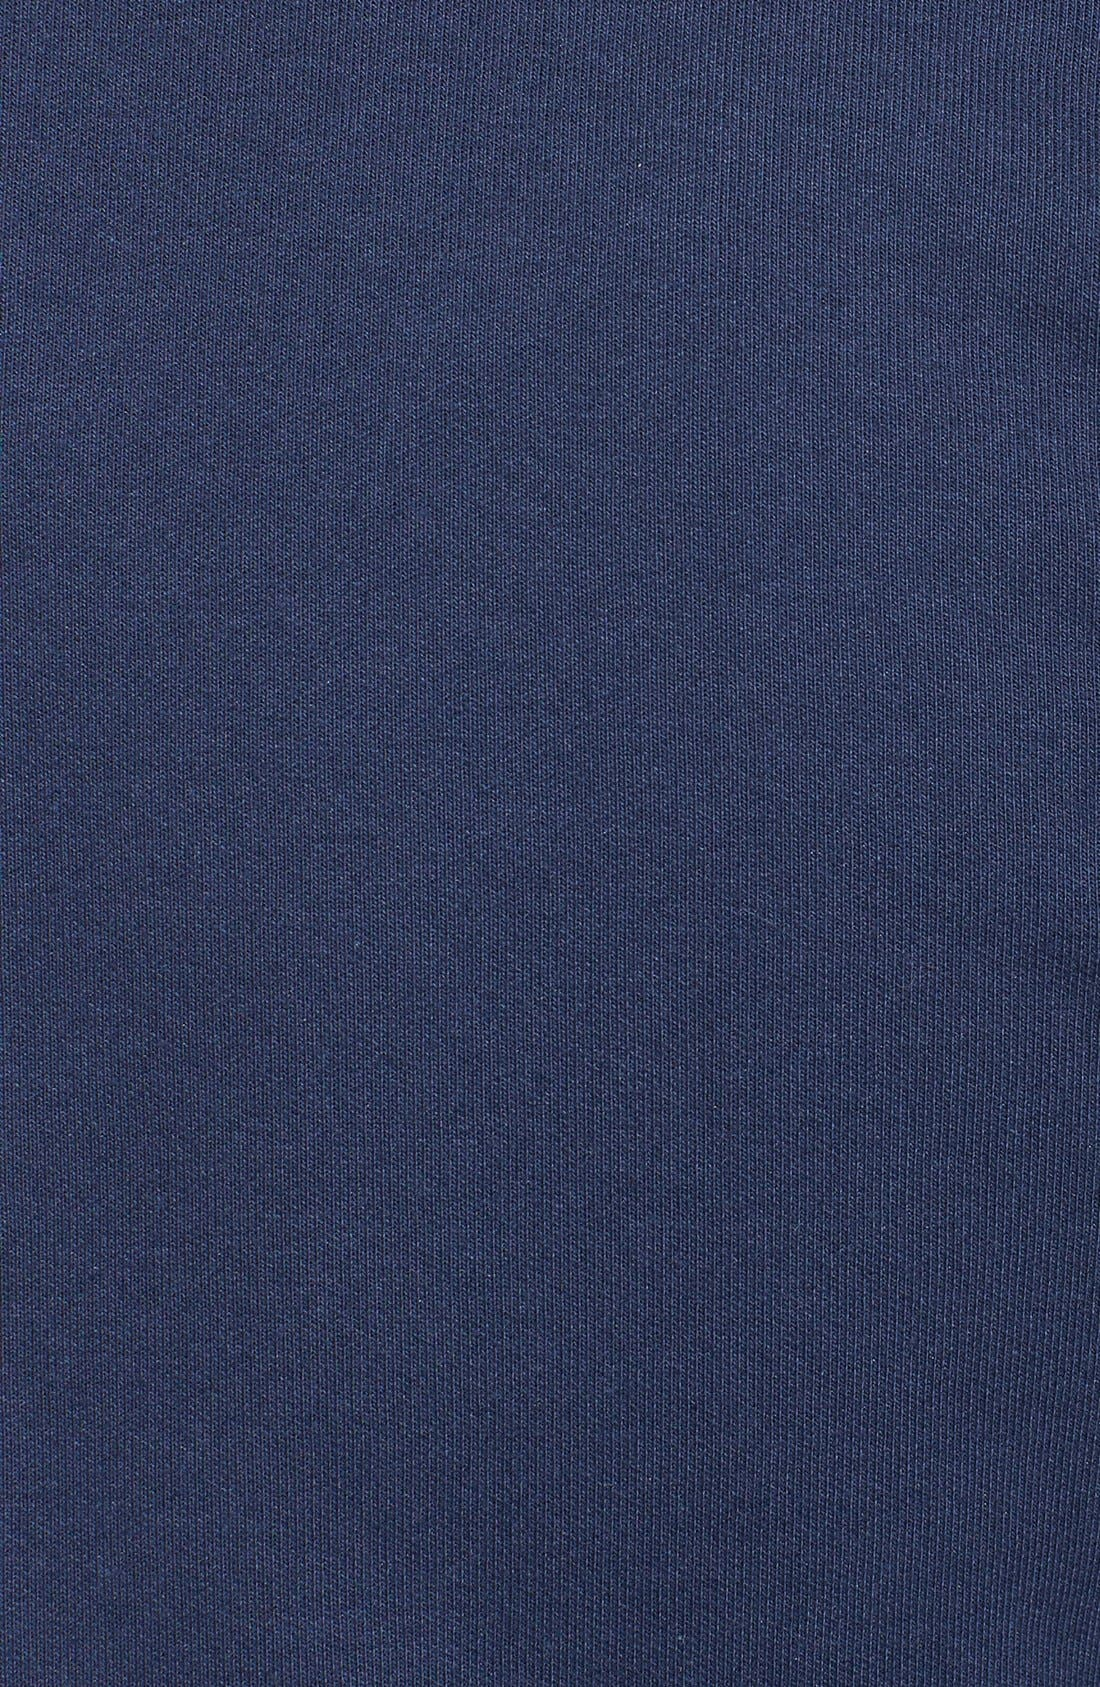 Alternate Image 3  - Lacoste L!VE Zip Track Jacket